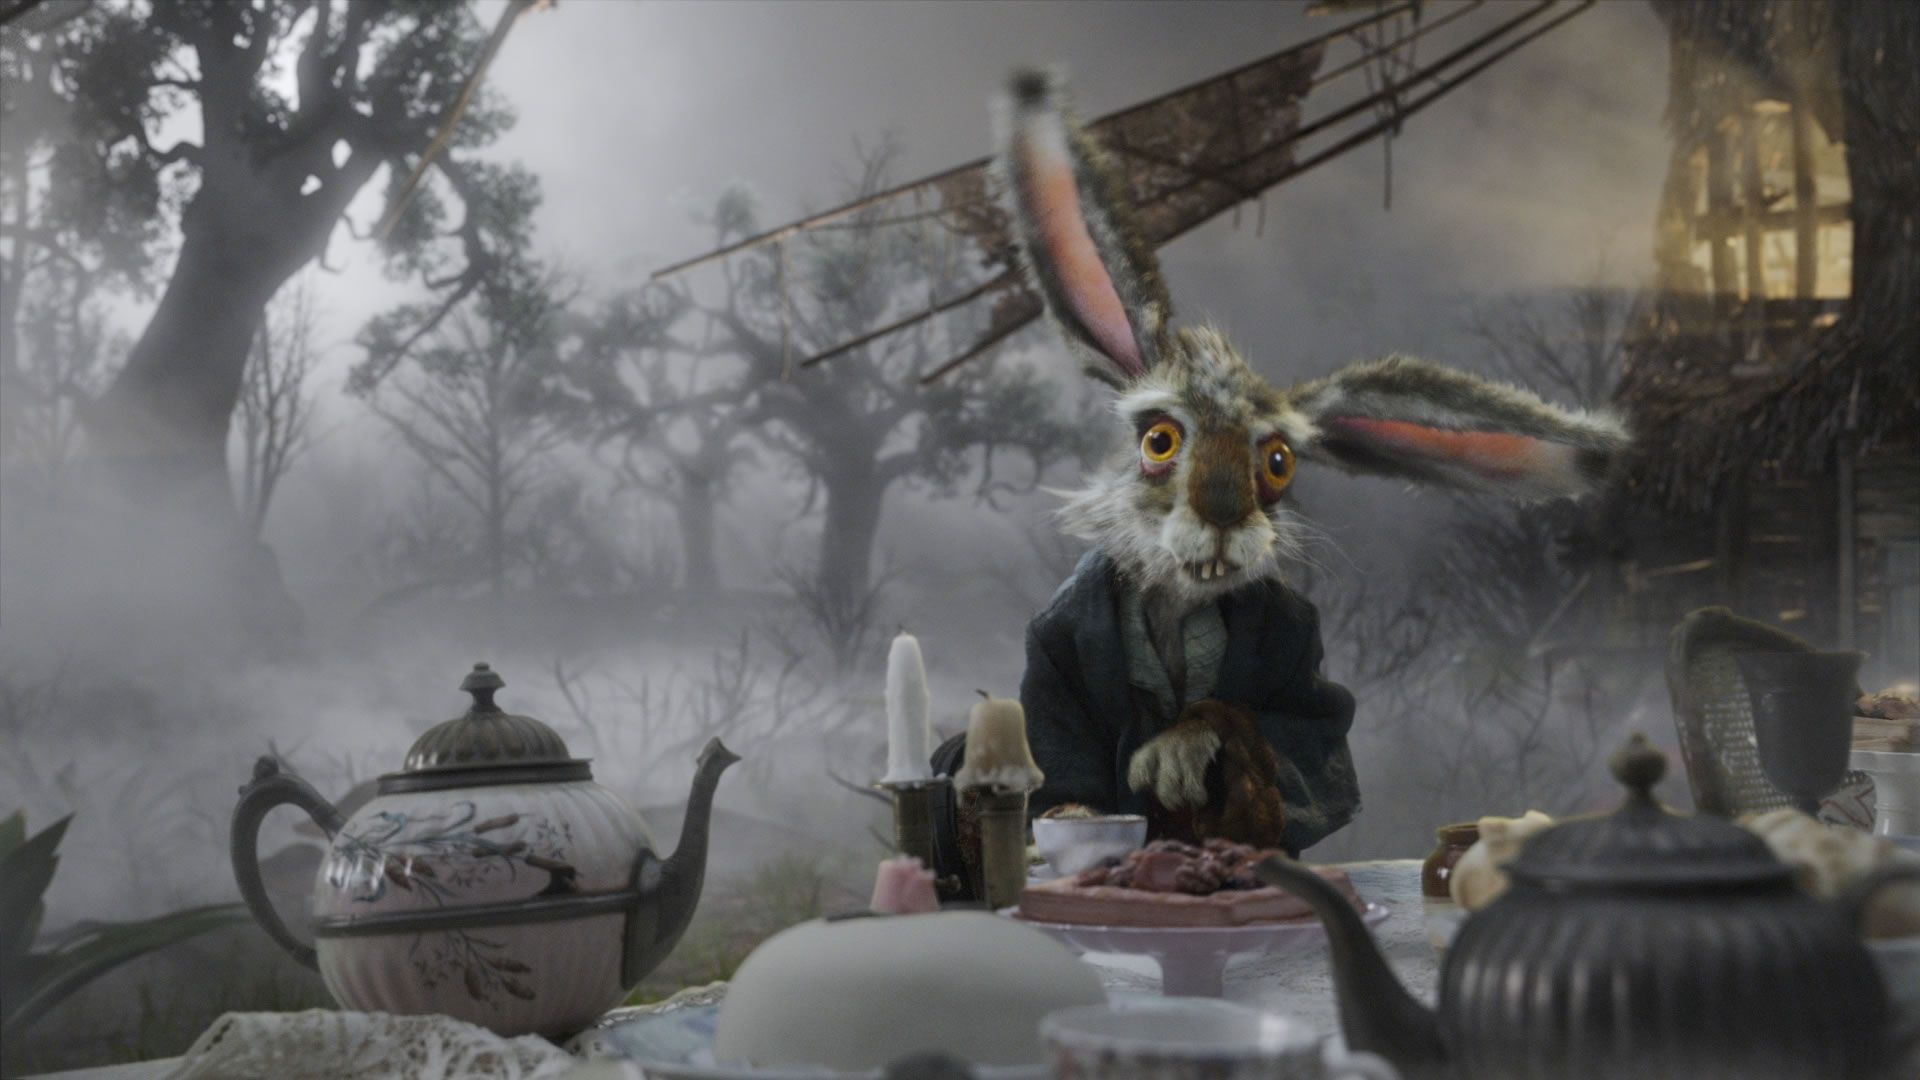 Alice In Wonderland 2010 Hd Wallpaper Background Image